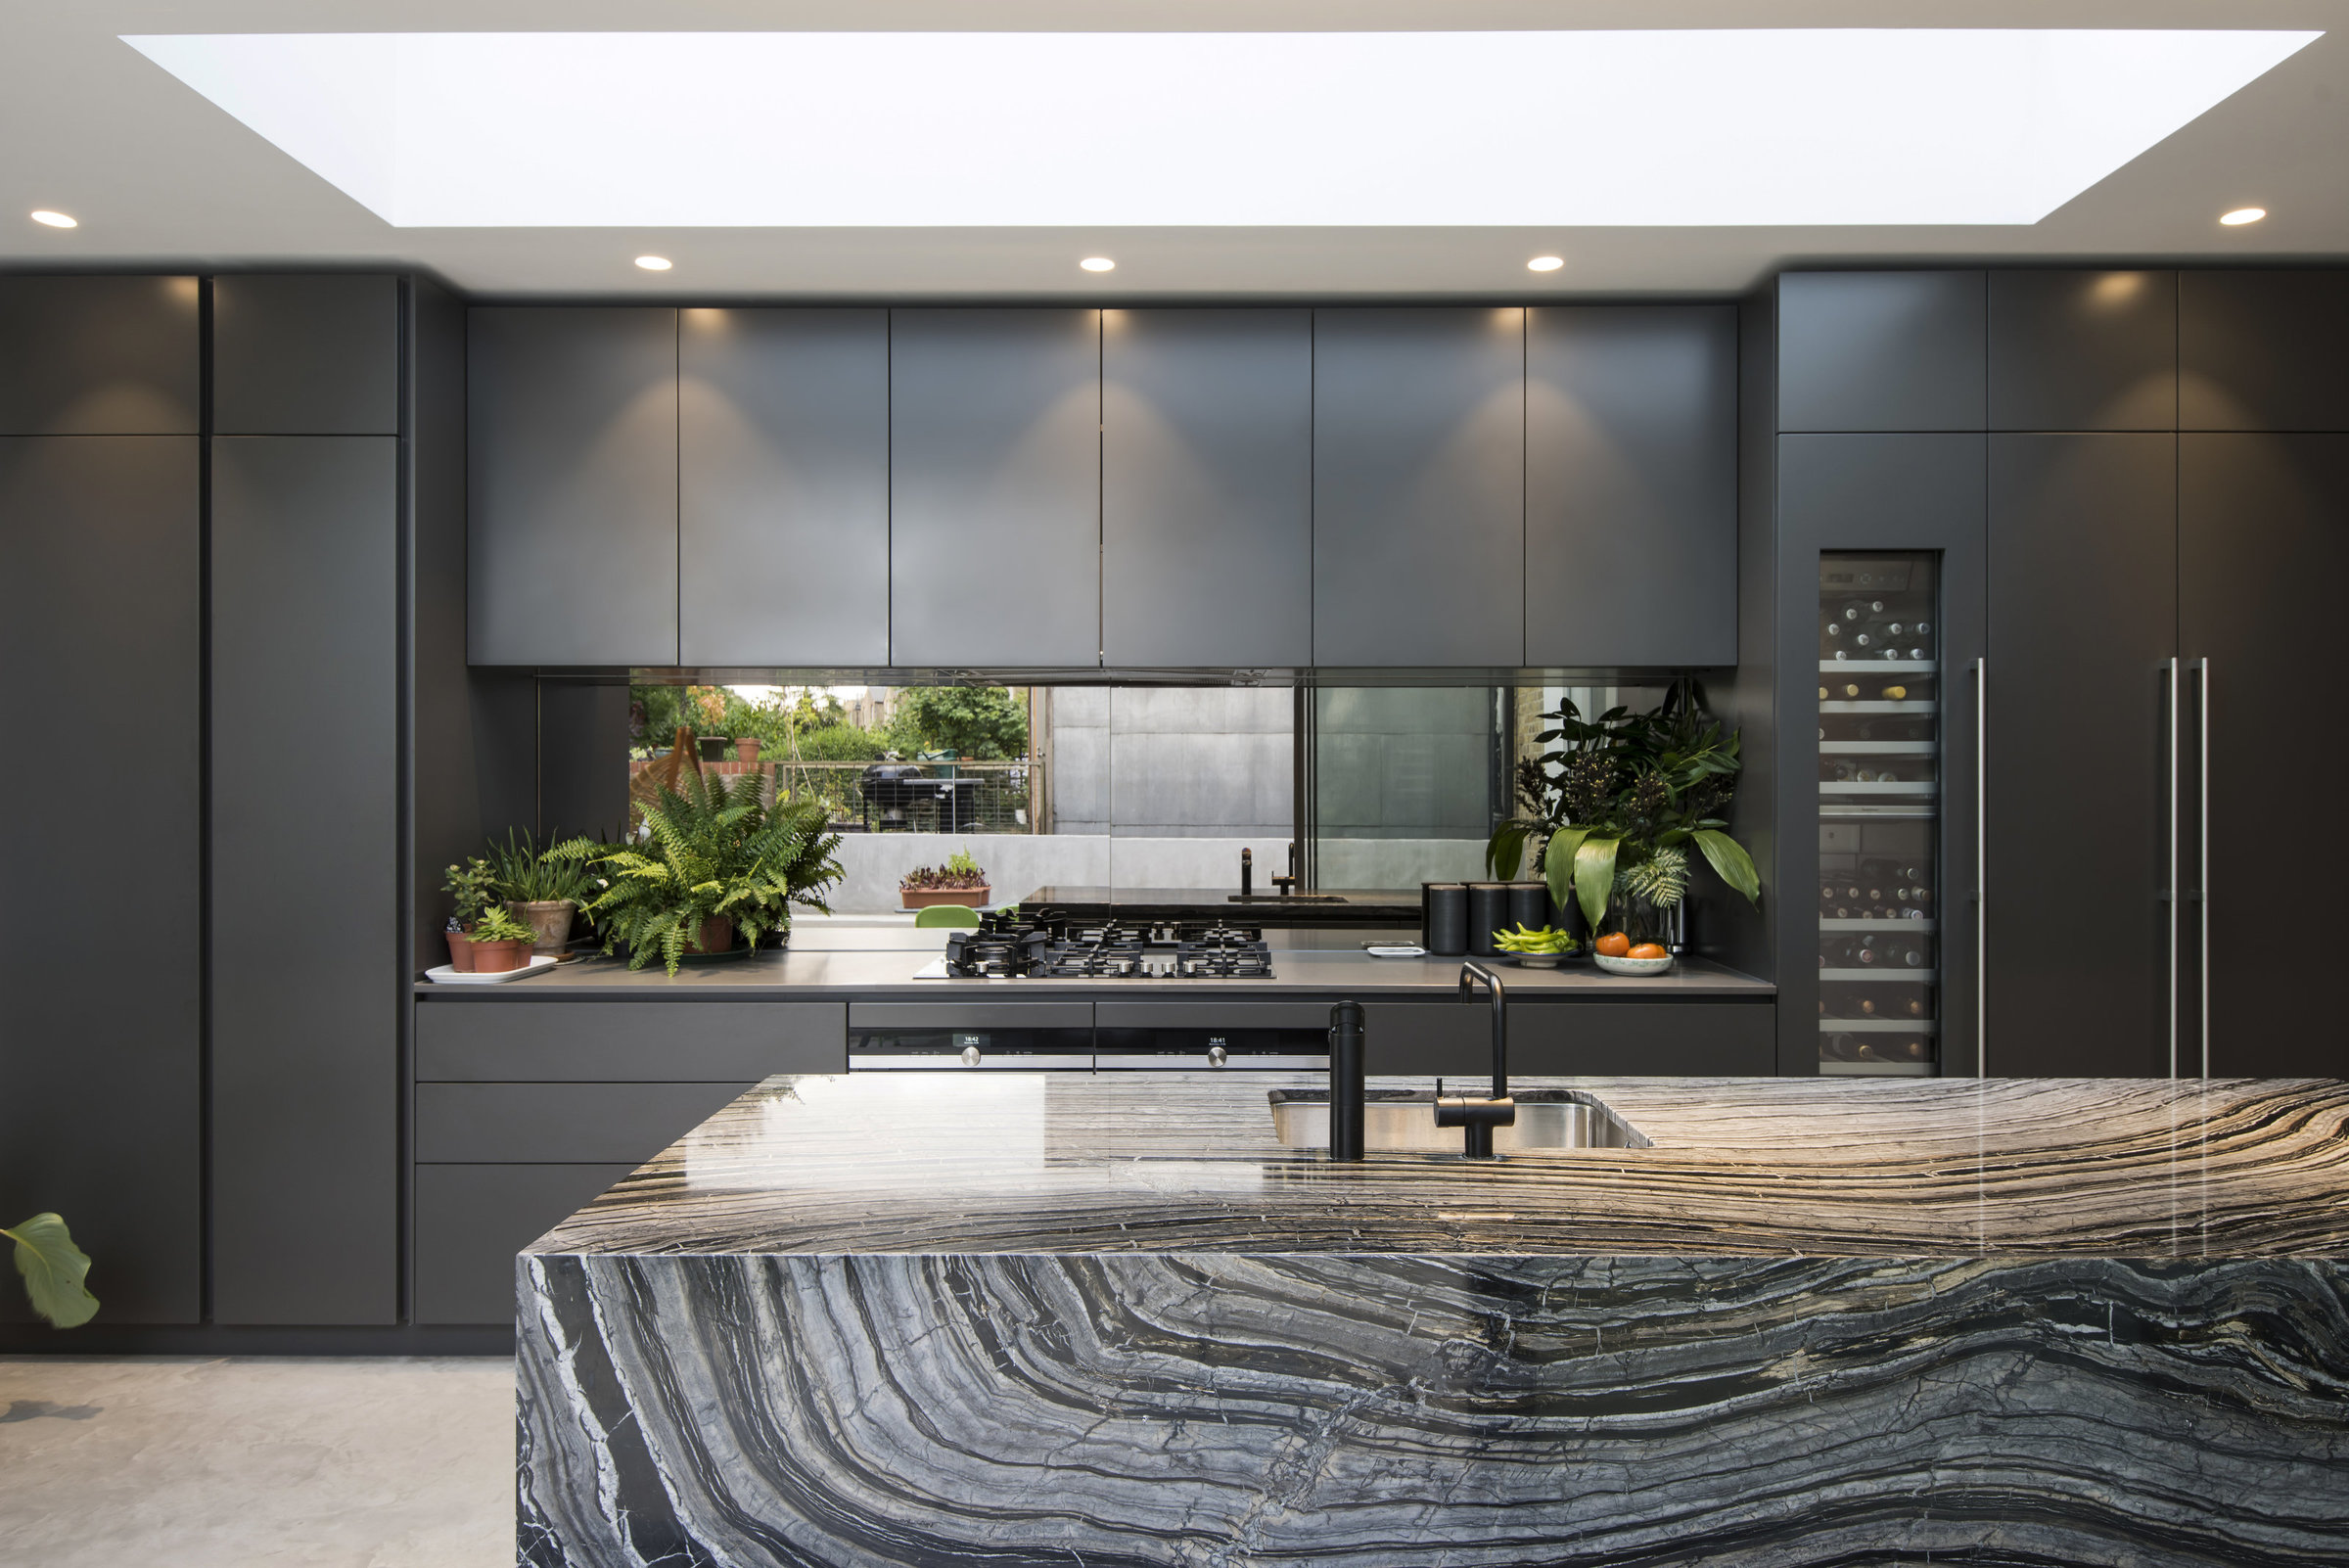 marek_sikora_kitchen_interior_hermantes_basha.jpg